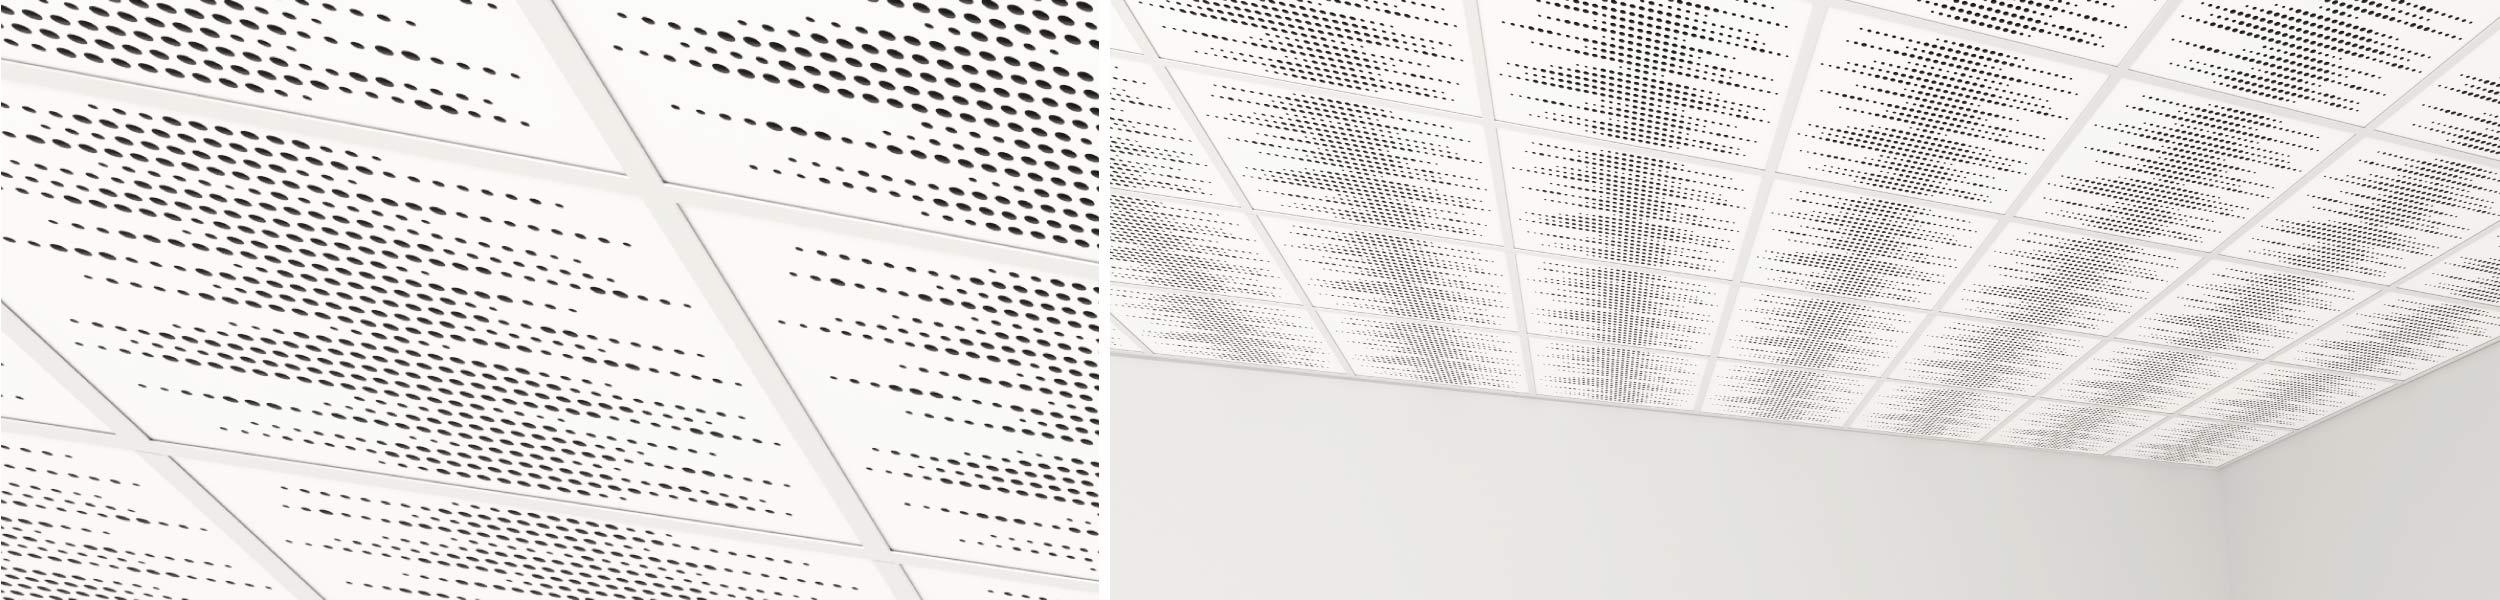 Artnovion product athos sqr ceiling tile clone cee3e9d21b